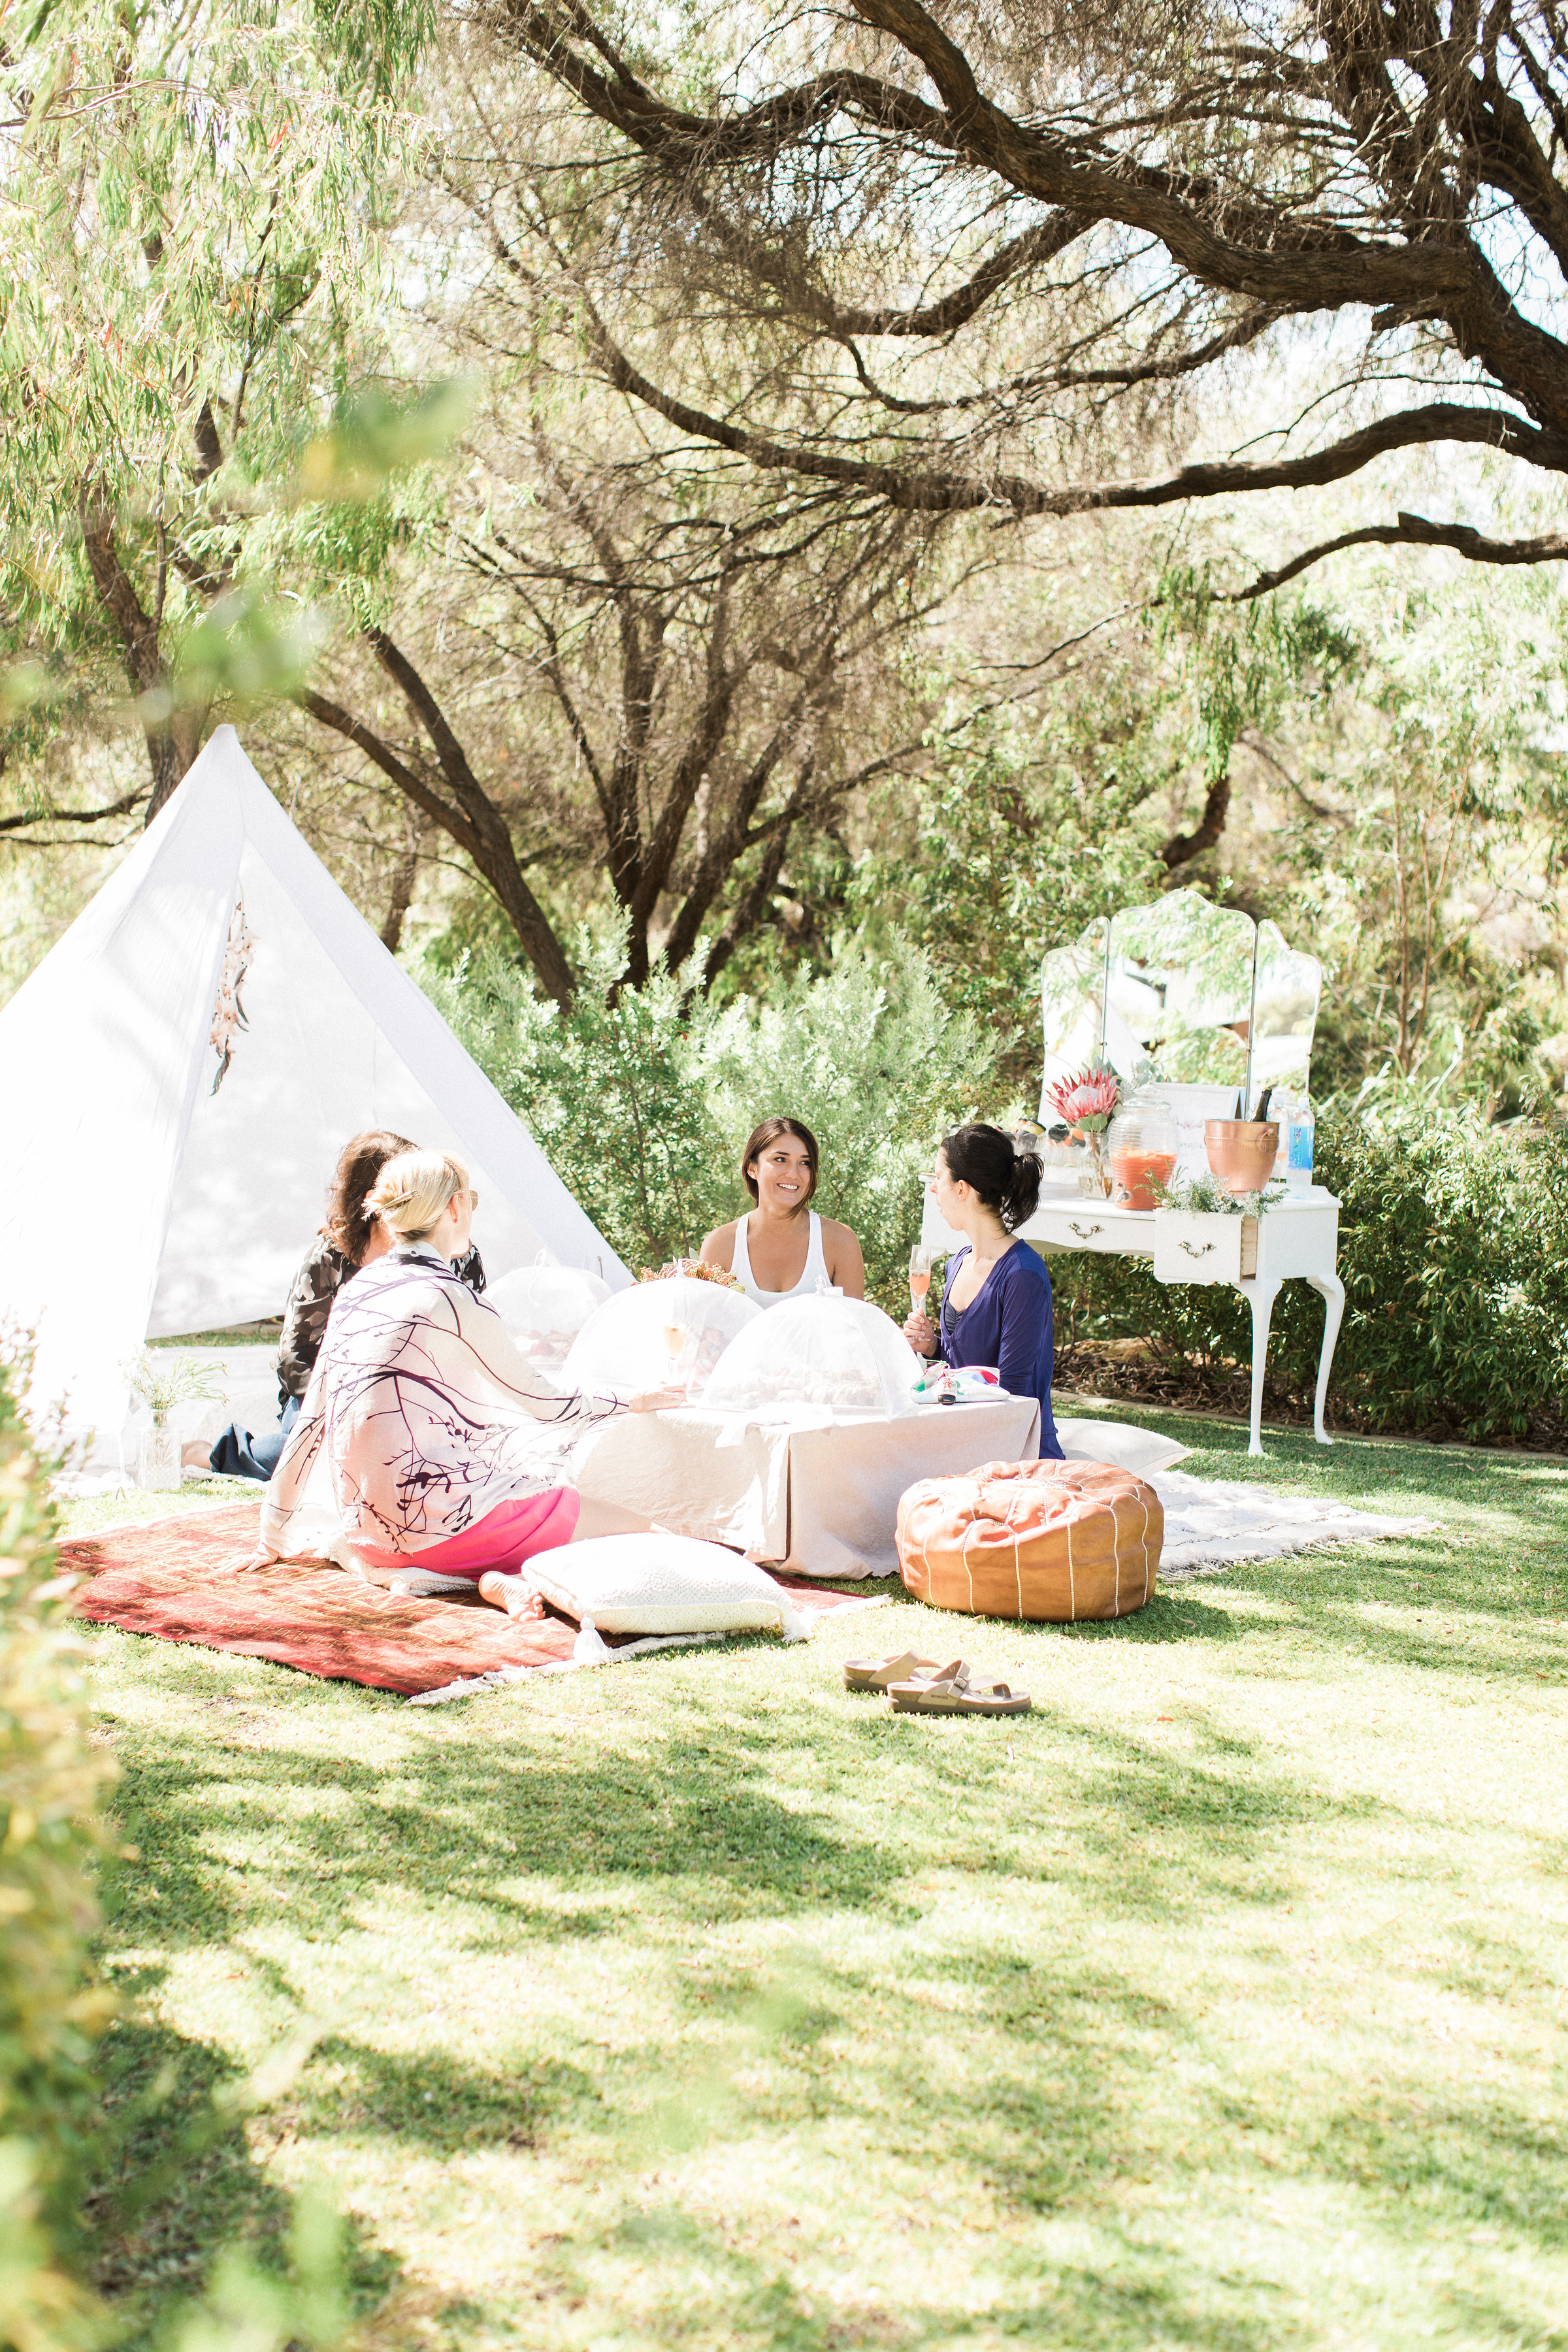 bridal-shower-hens-picnic-margaret-river-dunsborough